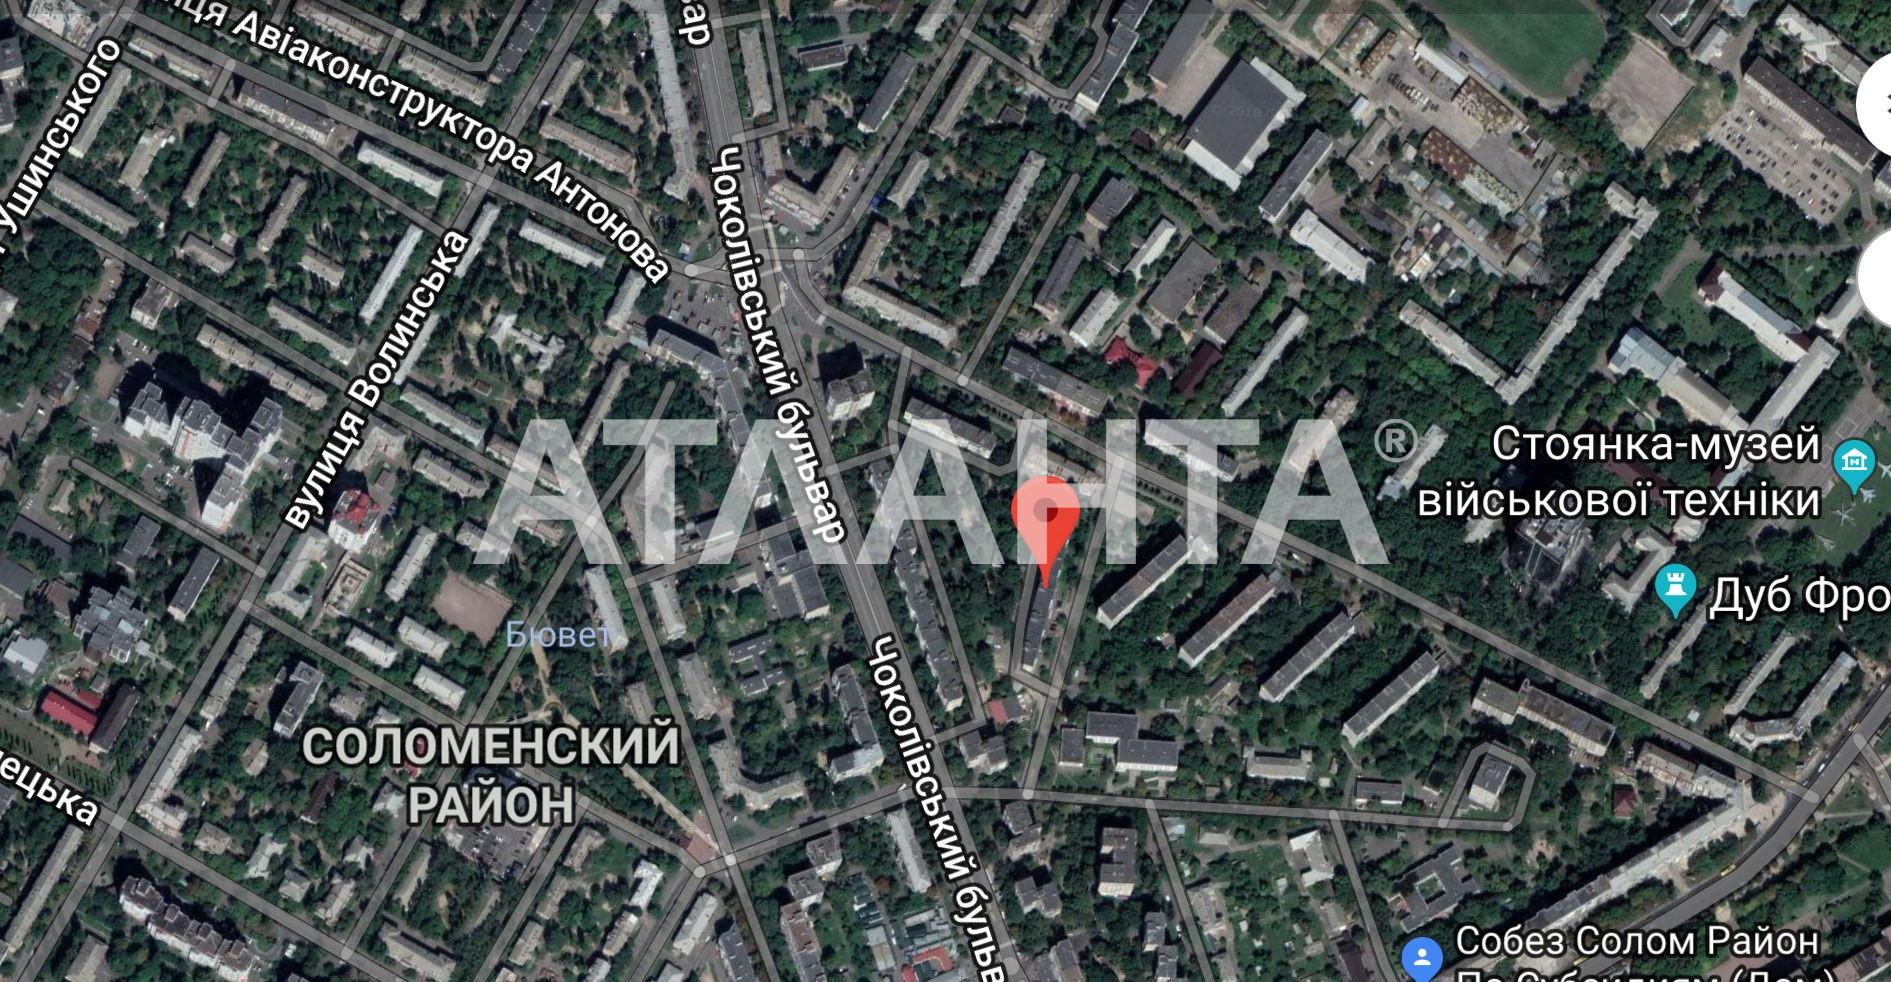 Продается 2-комнатная Квартира на ул. Авиаконструктора Антонова — 42 000 у.е. (фото №10)